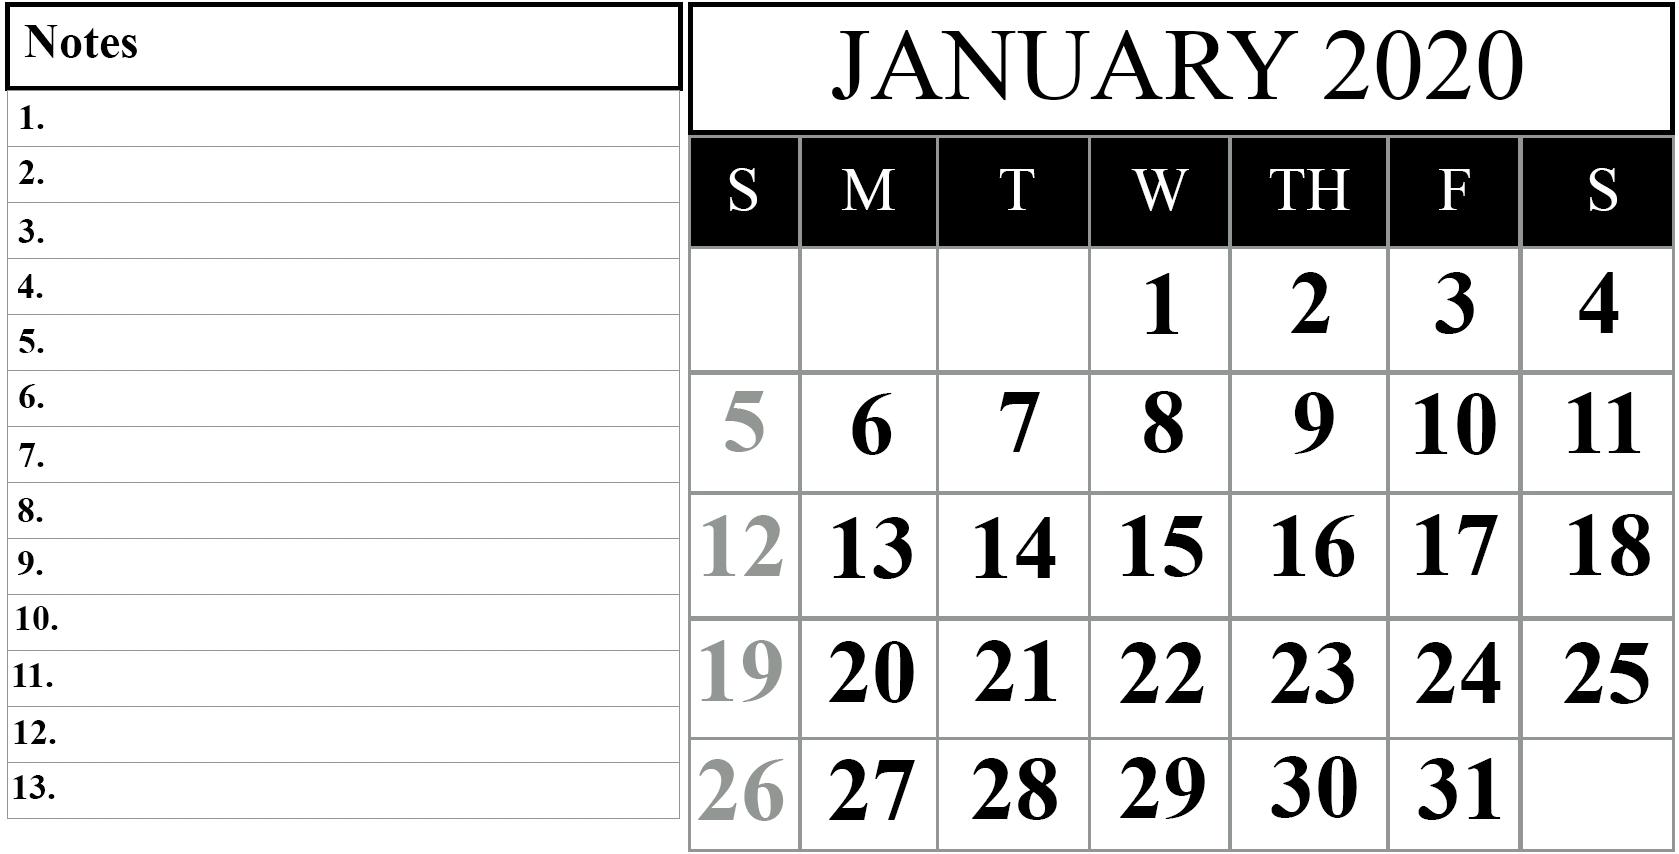 Free January 2020 Printable Calendar In Pdf, Excel & Word-January 2020 Calendar Microsoft Word